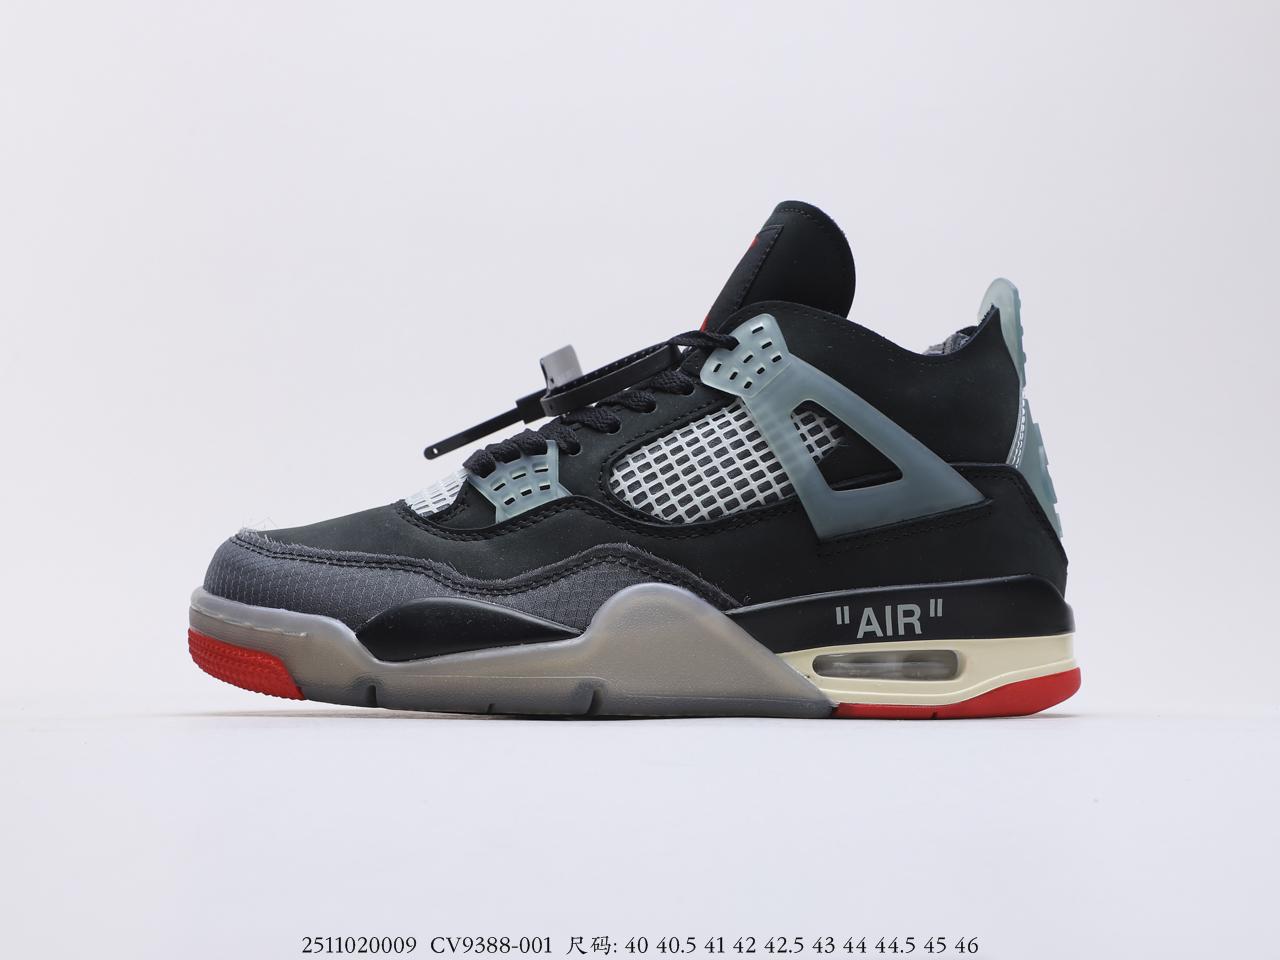 "乔丹Off-White™ x Air Jordan AJ4 RetroCreamSail""OW联名"